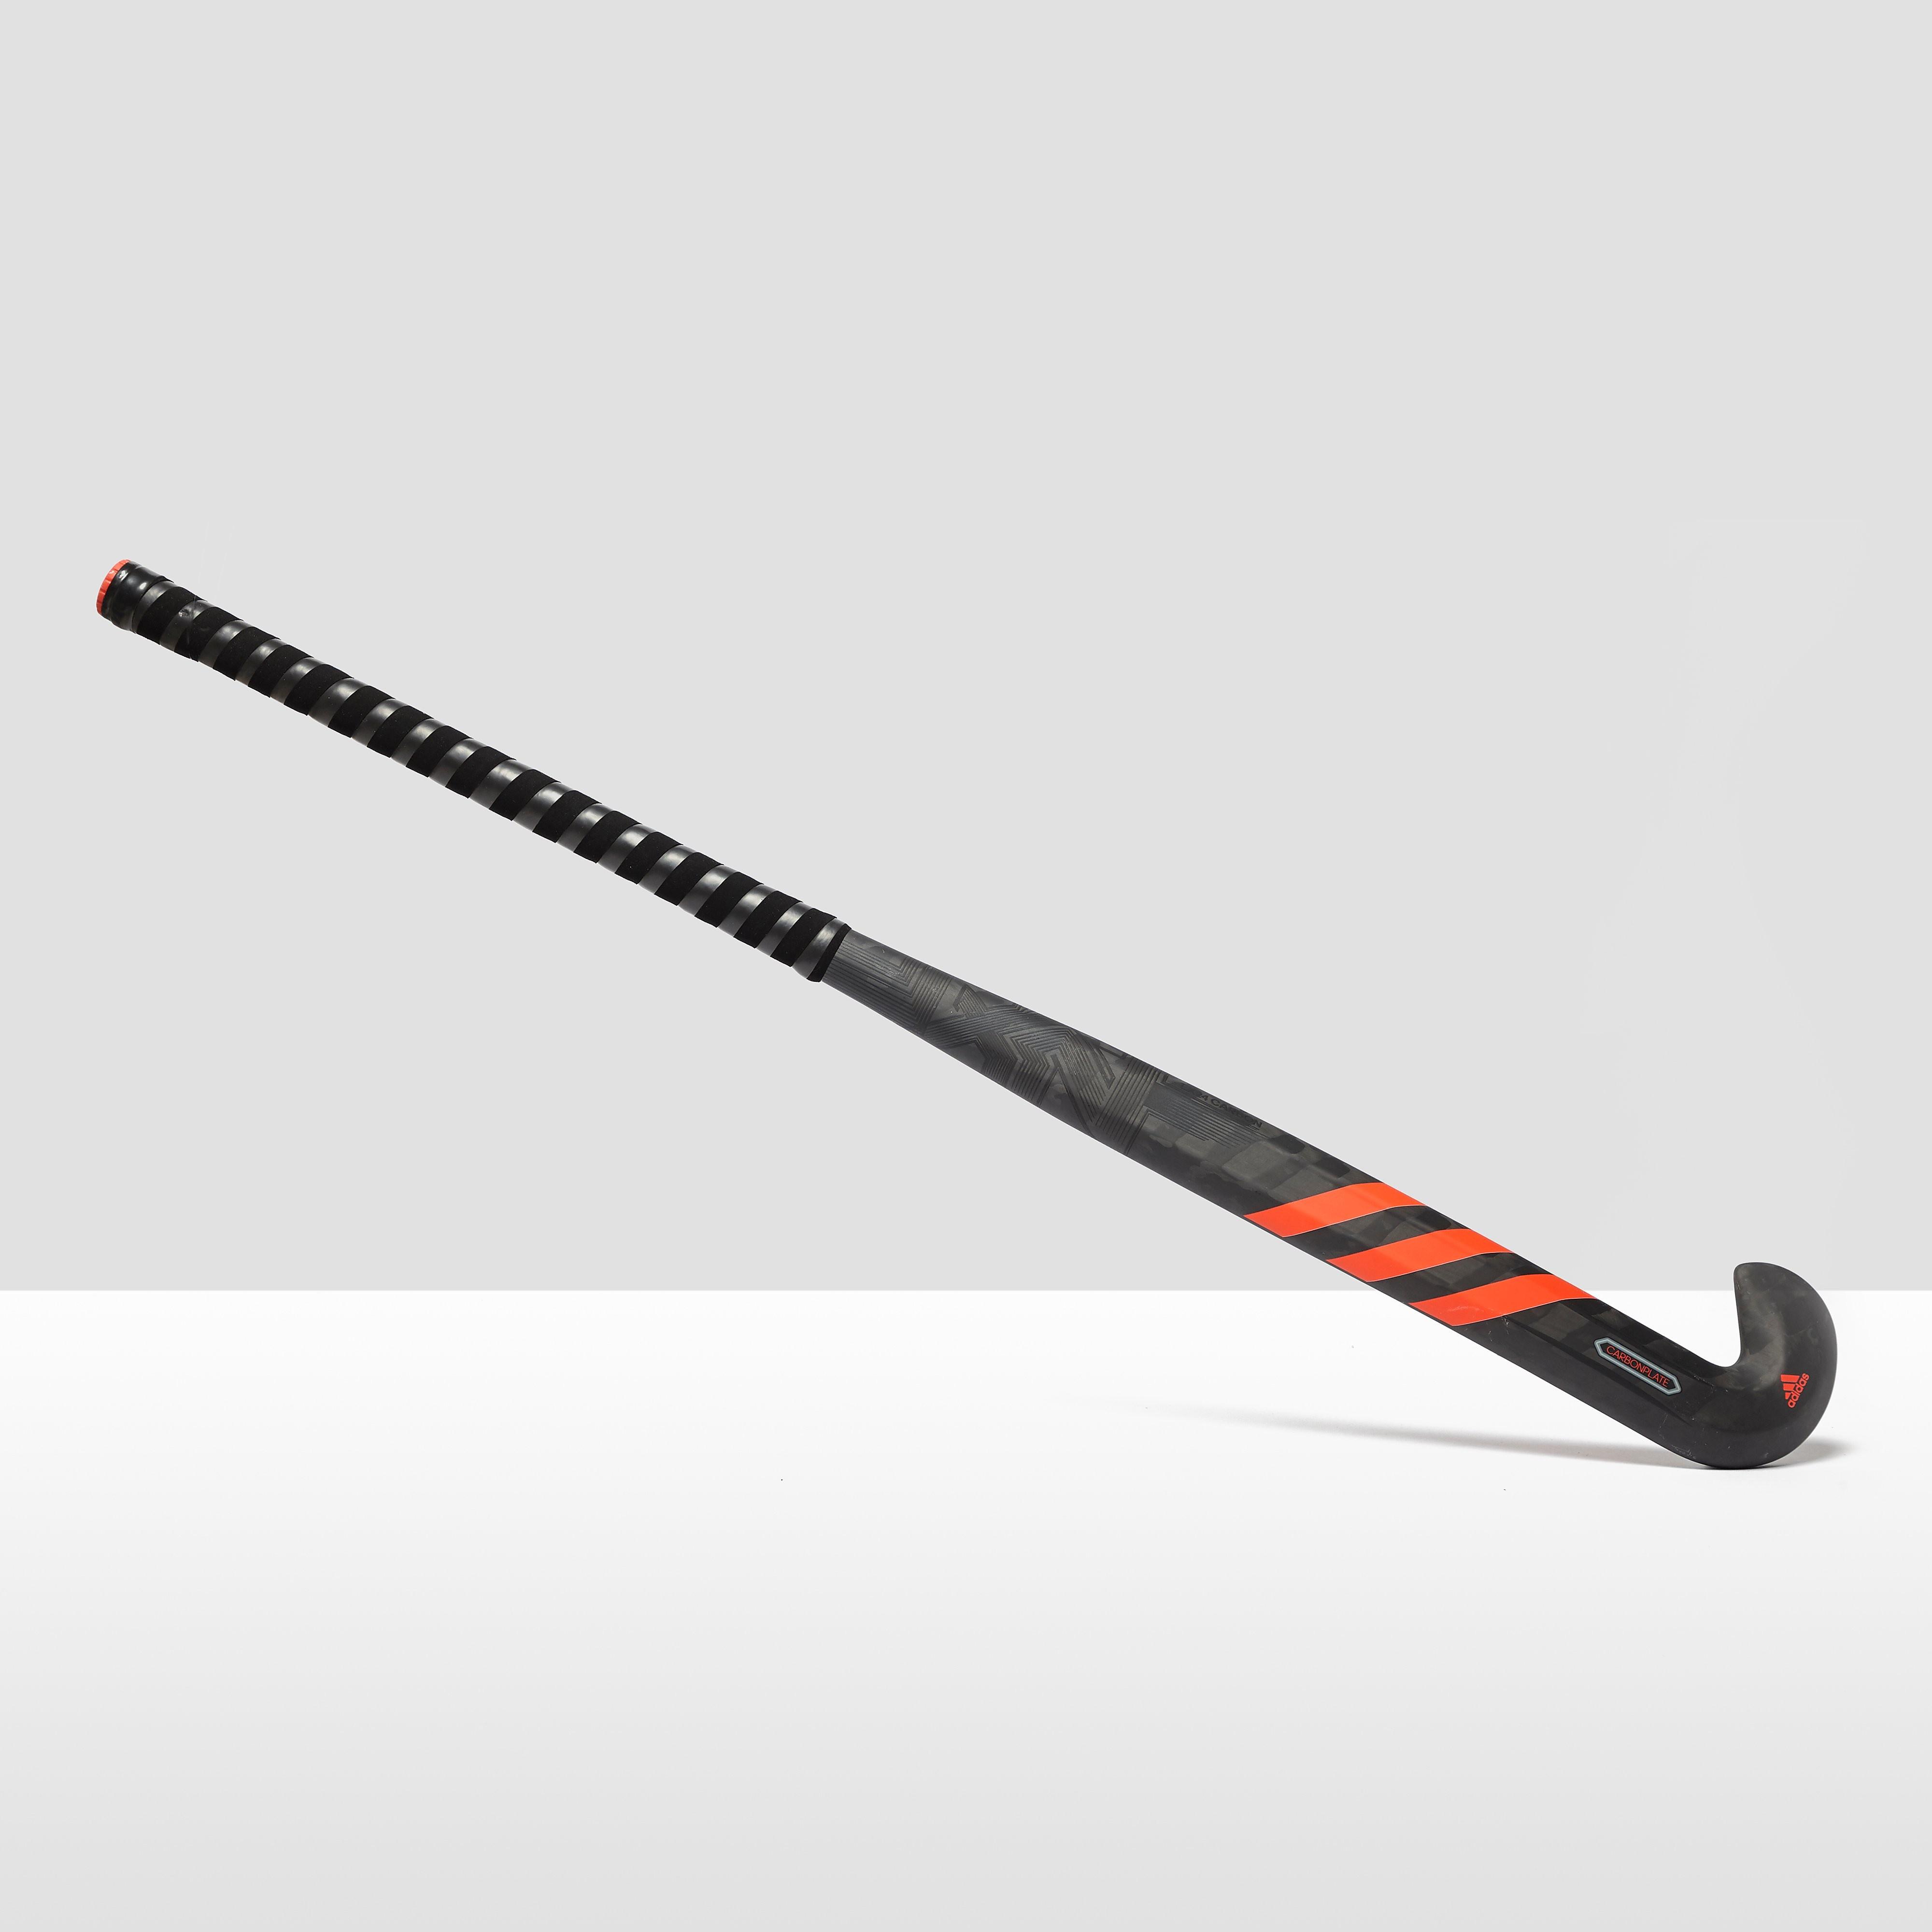 adidas LX24 Carbon Hockey Stick